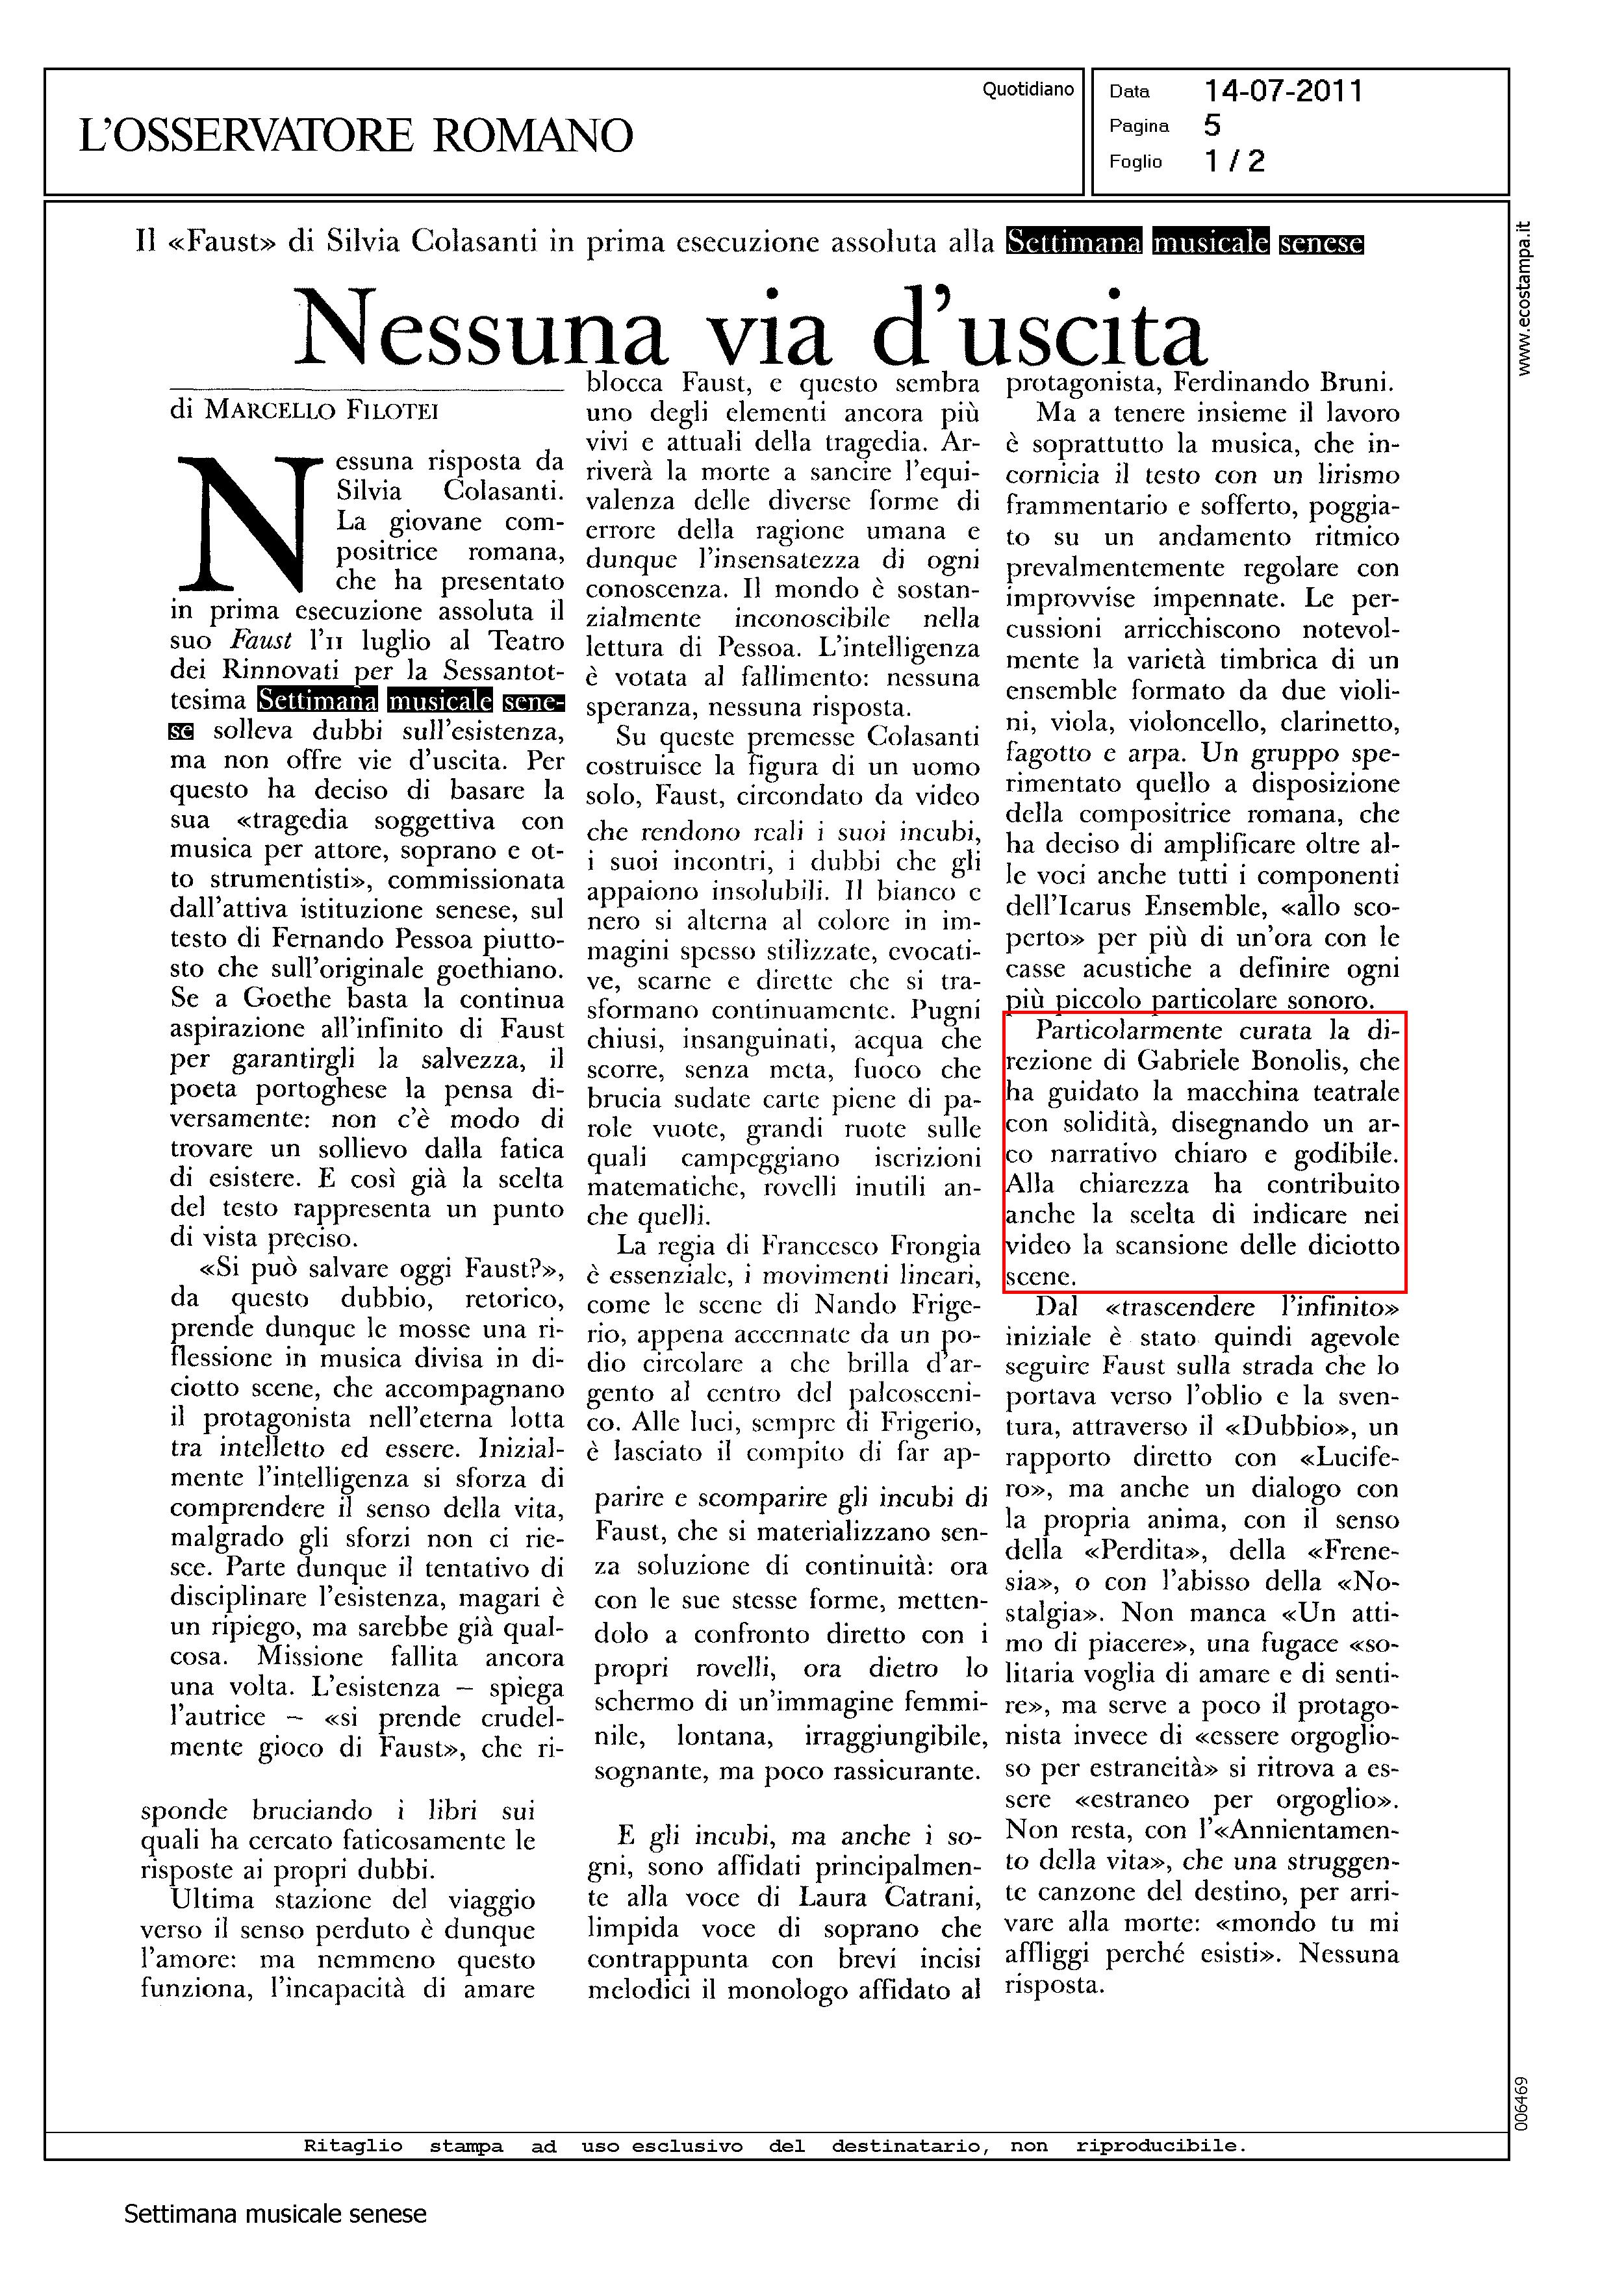 FAUST Osservatore Romano lug 2011